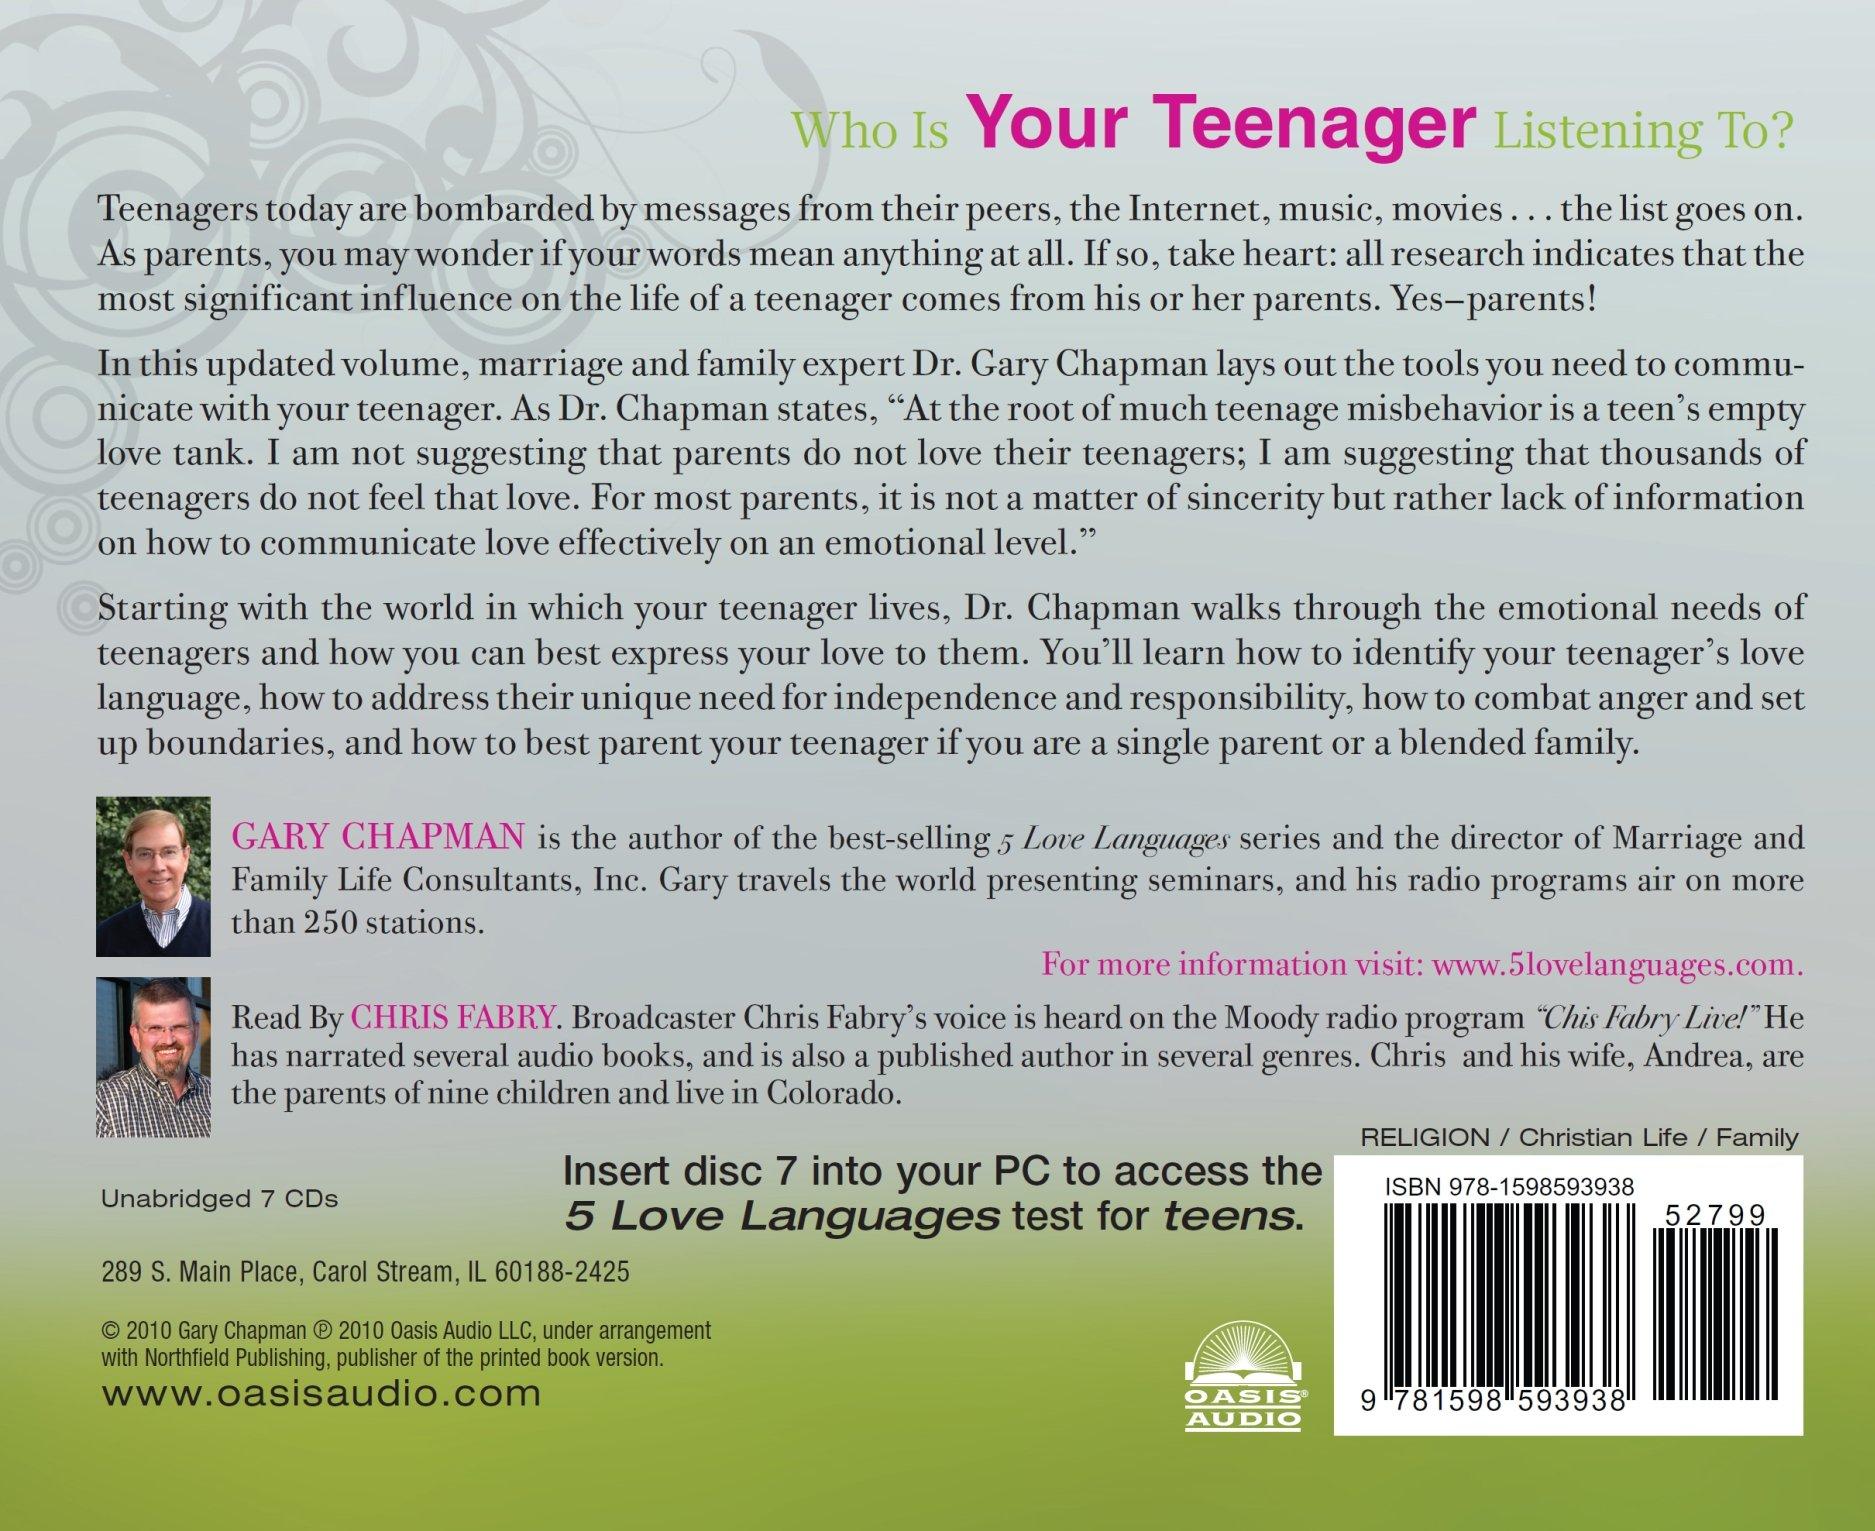 The 5 Love Languages Ofagers Gary Chapman Chris Fabry 9781598593938 Amazon Com Books